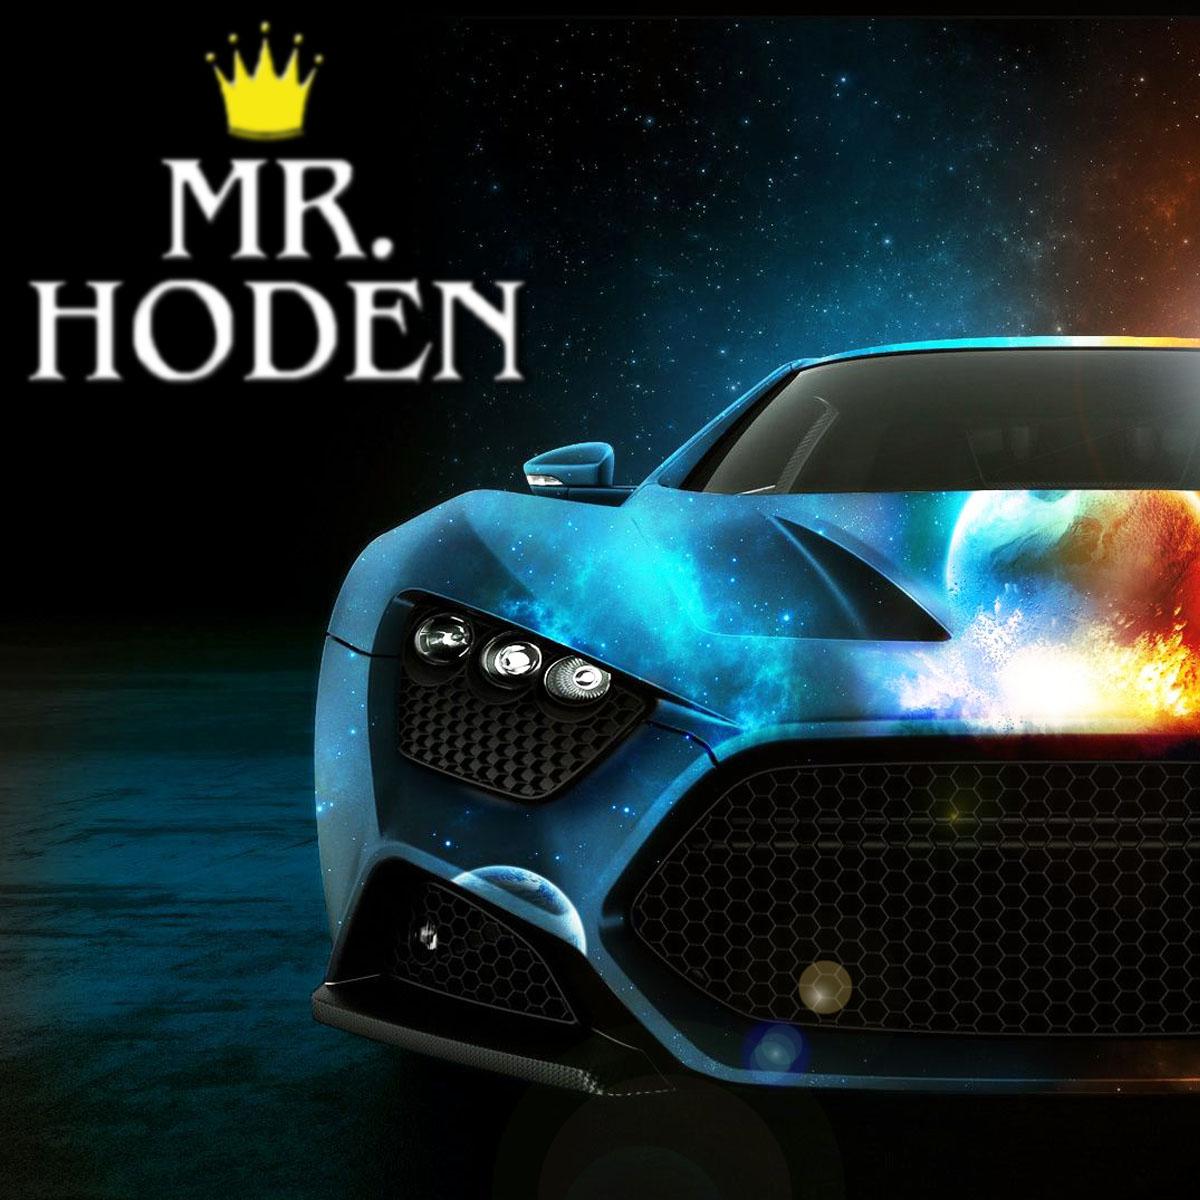 Upcoming: Mr. Hoden - Best Miami Bass Rap Beat 2021 [FREE BEAT]